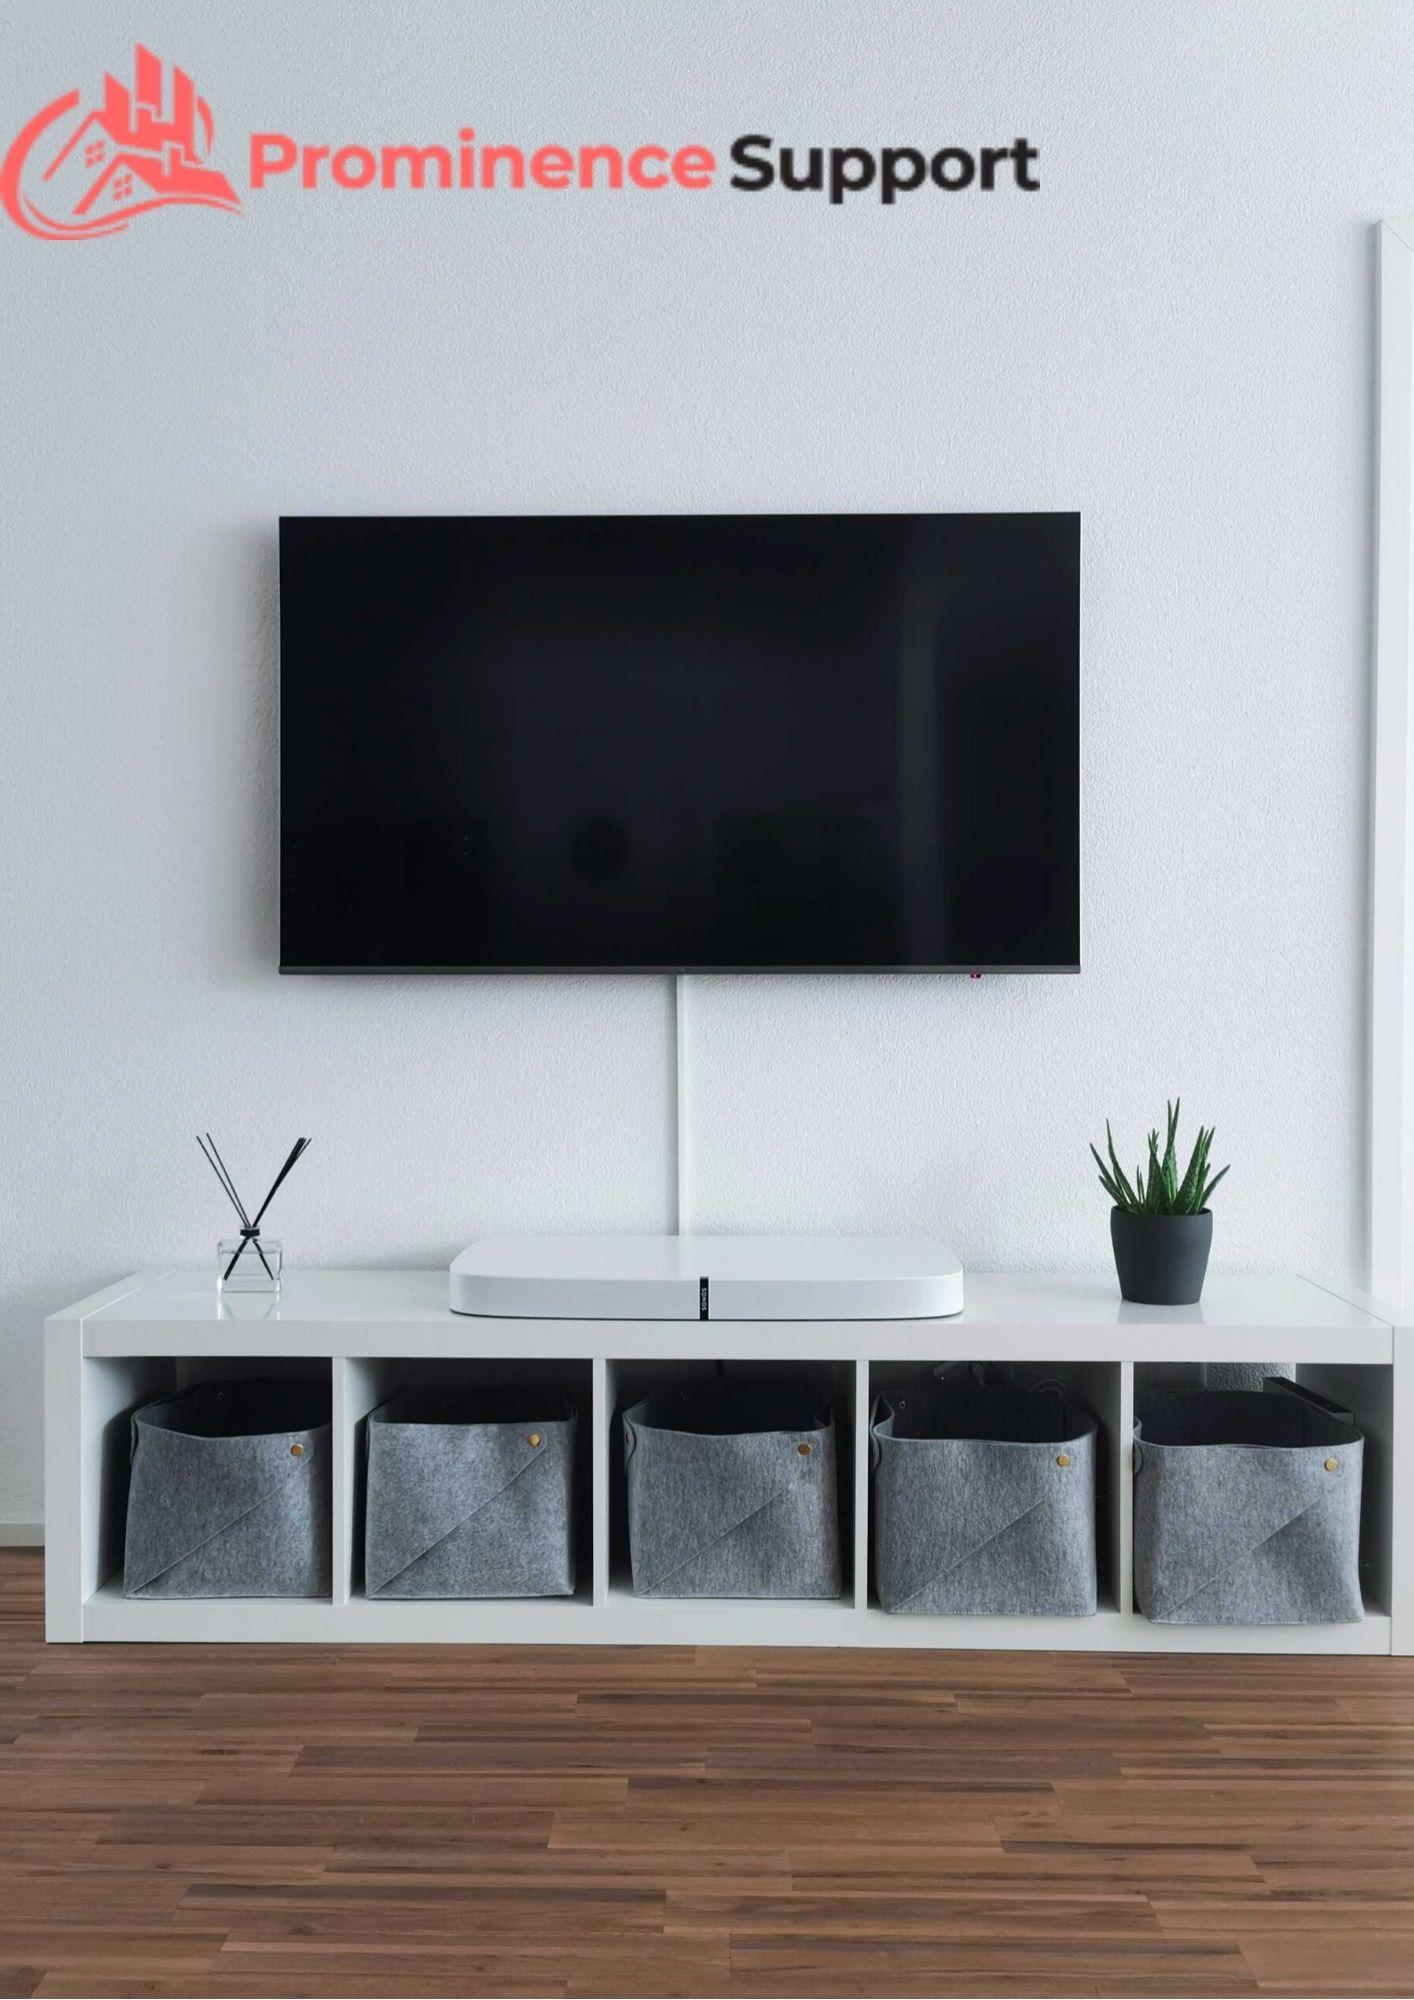 Insignia-TV-Insurance